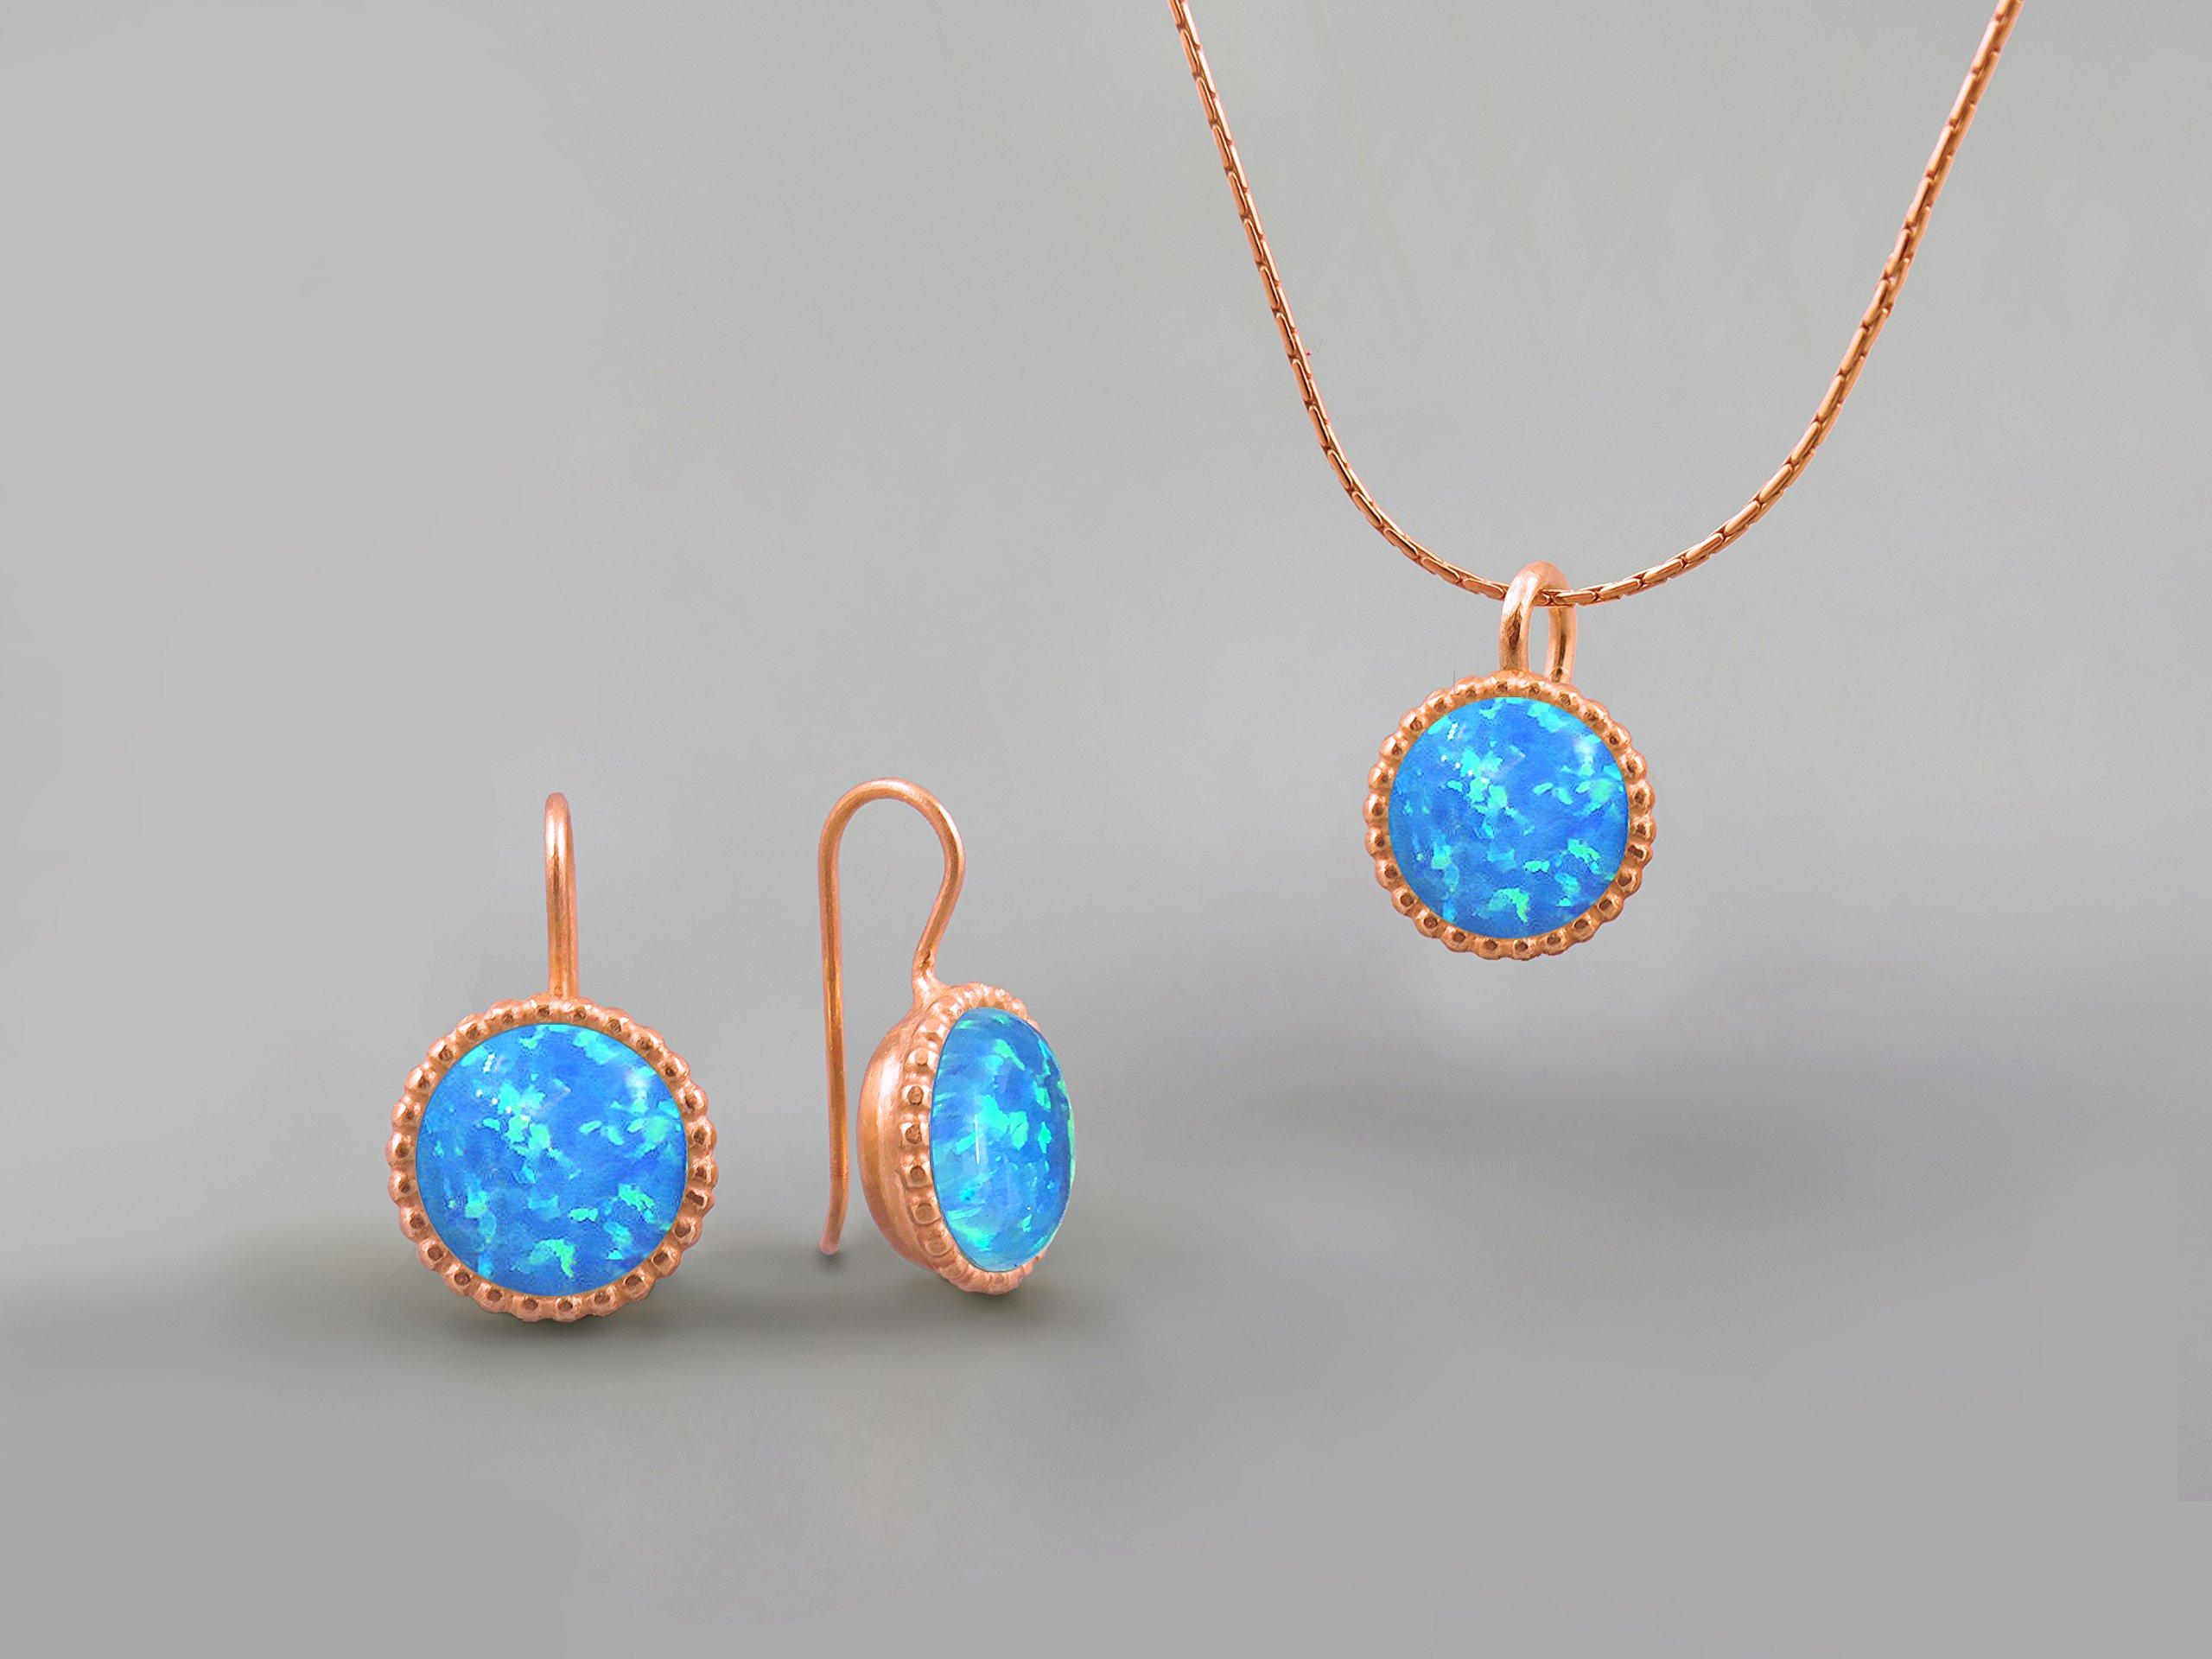 10 mm Blue Fire Opal Stones Round Jewelry Set For Women 14K Rose Gold October Birthstone Jewelry Opal Necklace Pendant Earring Set Gifts for Women Opal Jewelry Created Gemstone Custom Jewelry Handmade